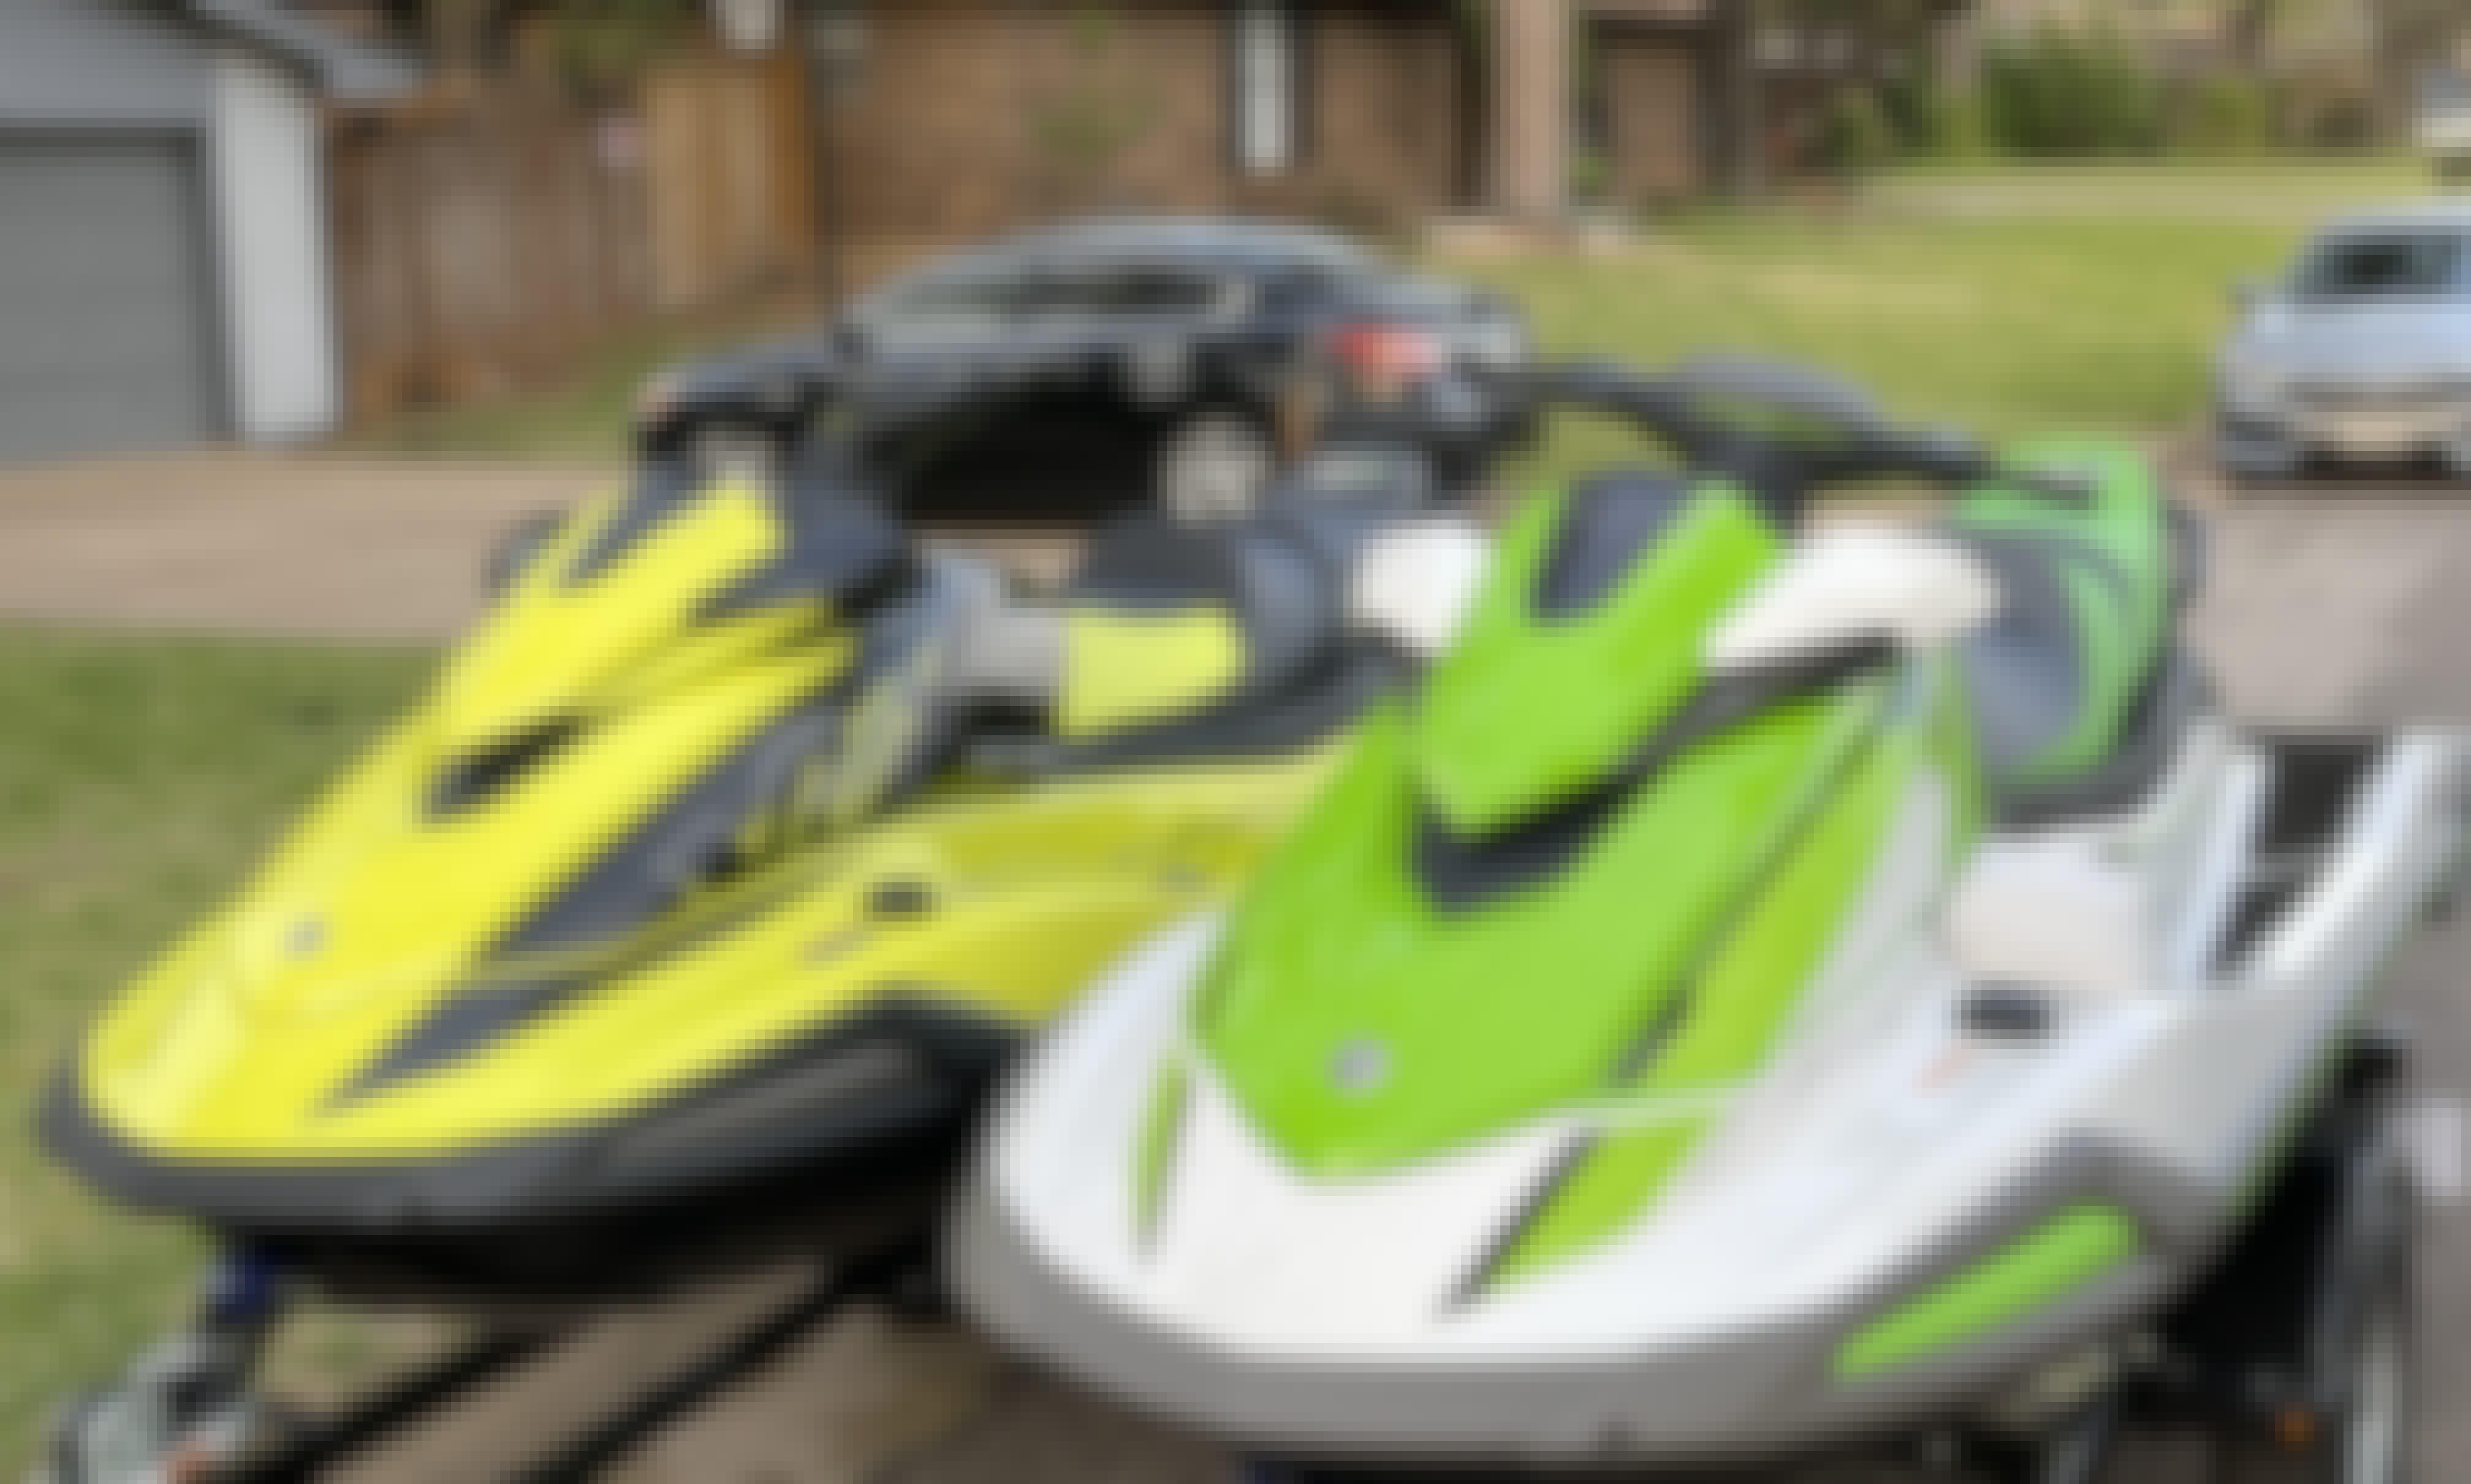 2021 Yamaha Waverunner Jet Skis For Rent x 2 | Cedar Creek Lake